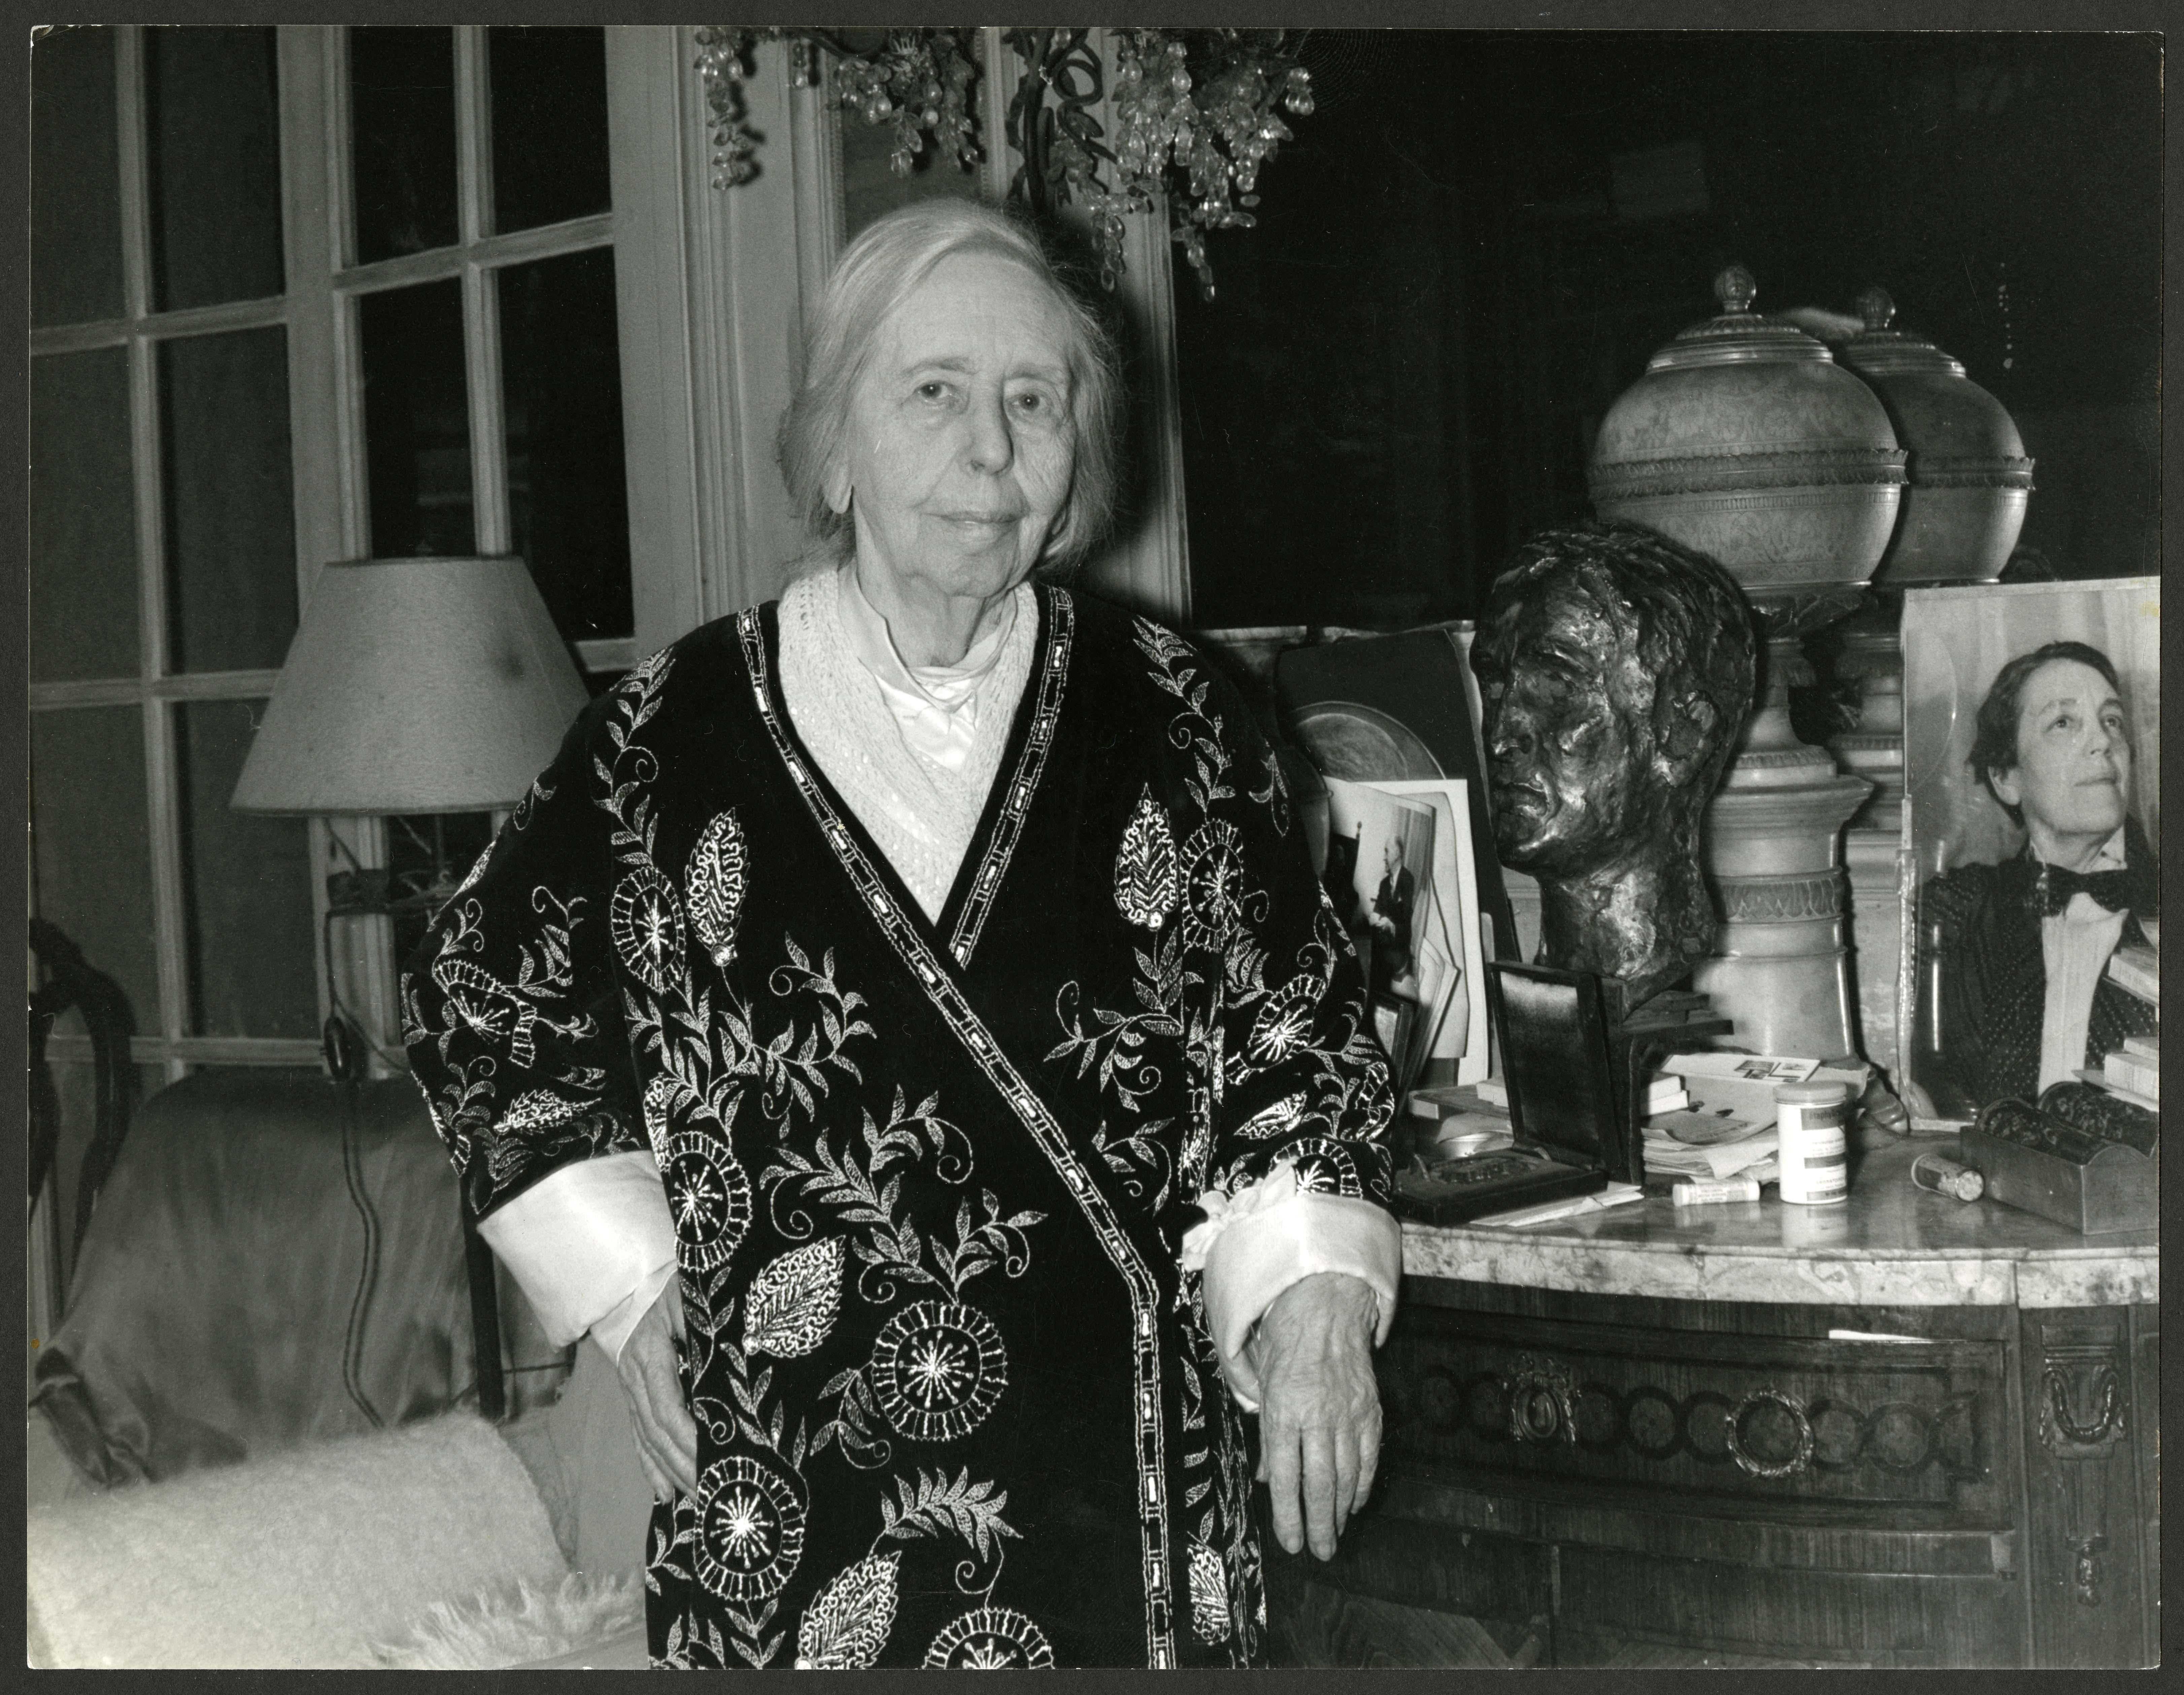 Natalie Clifford Barney, c. 1965.